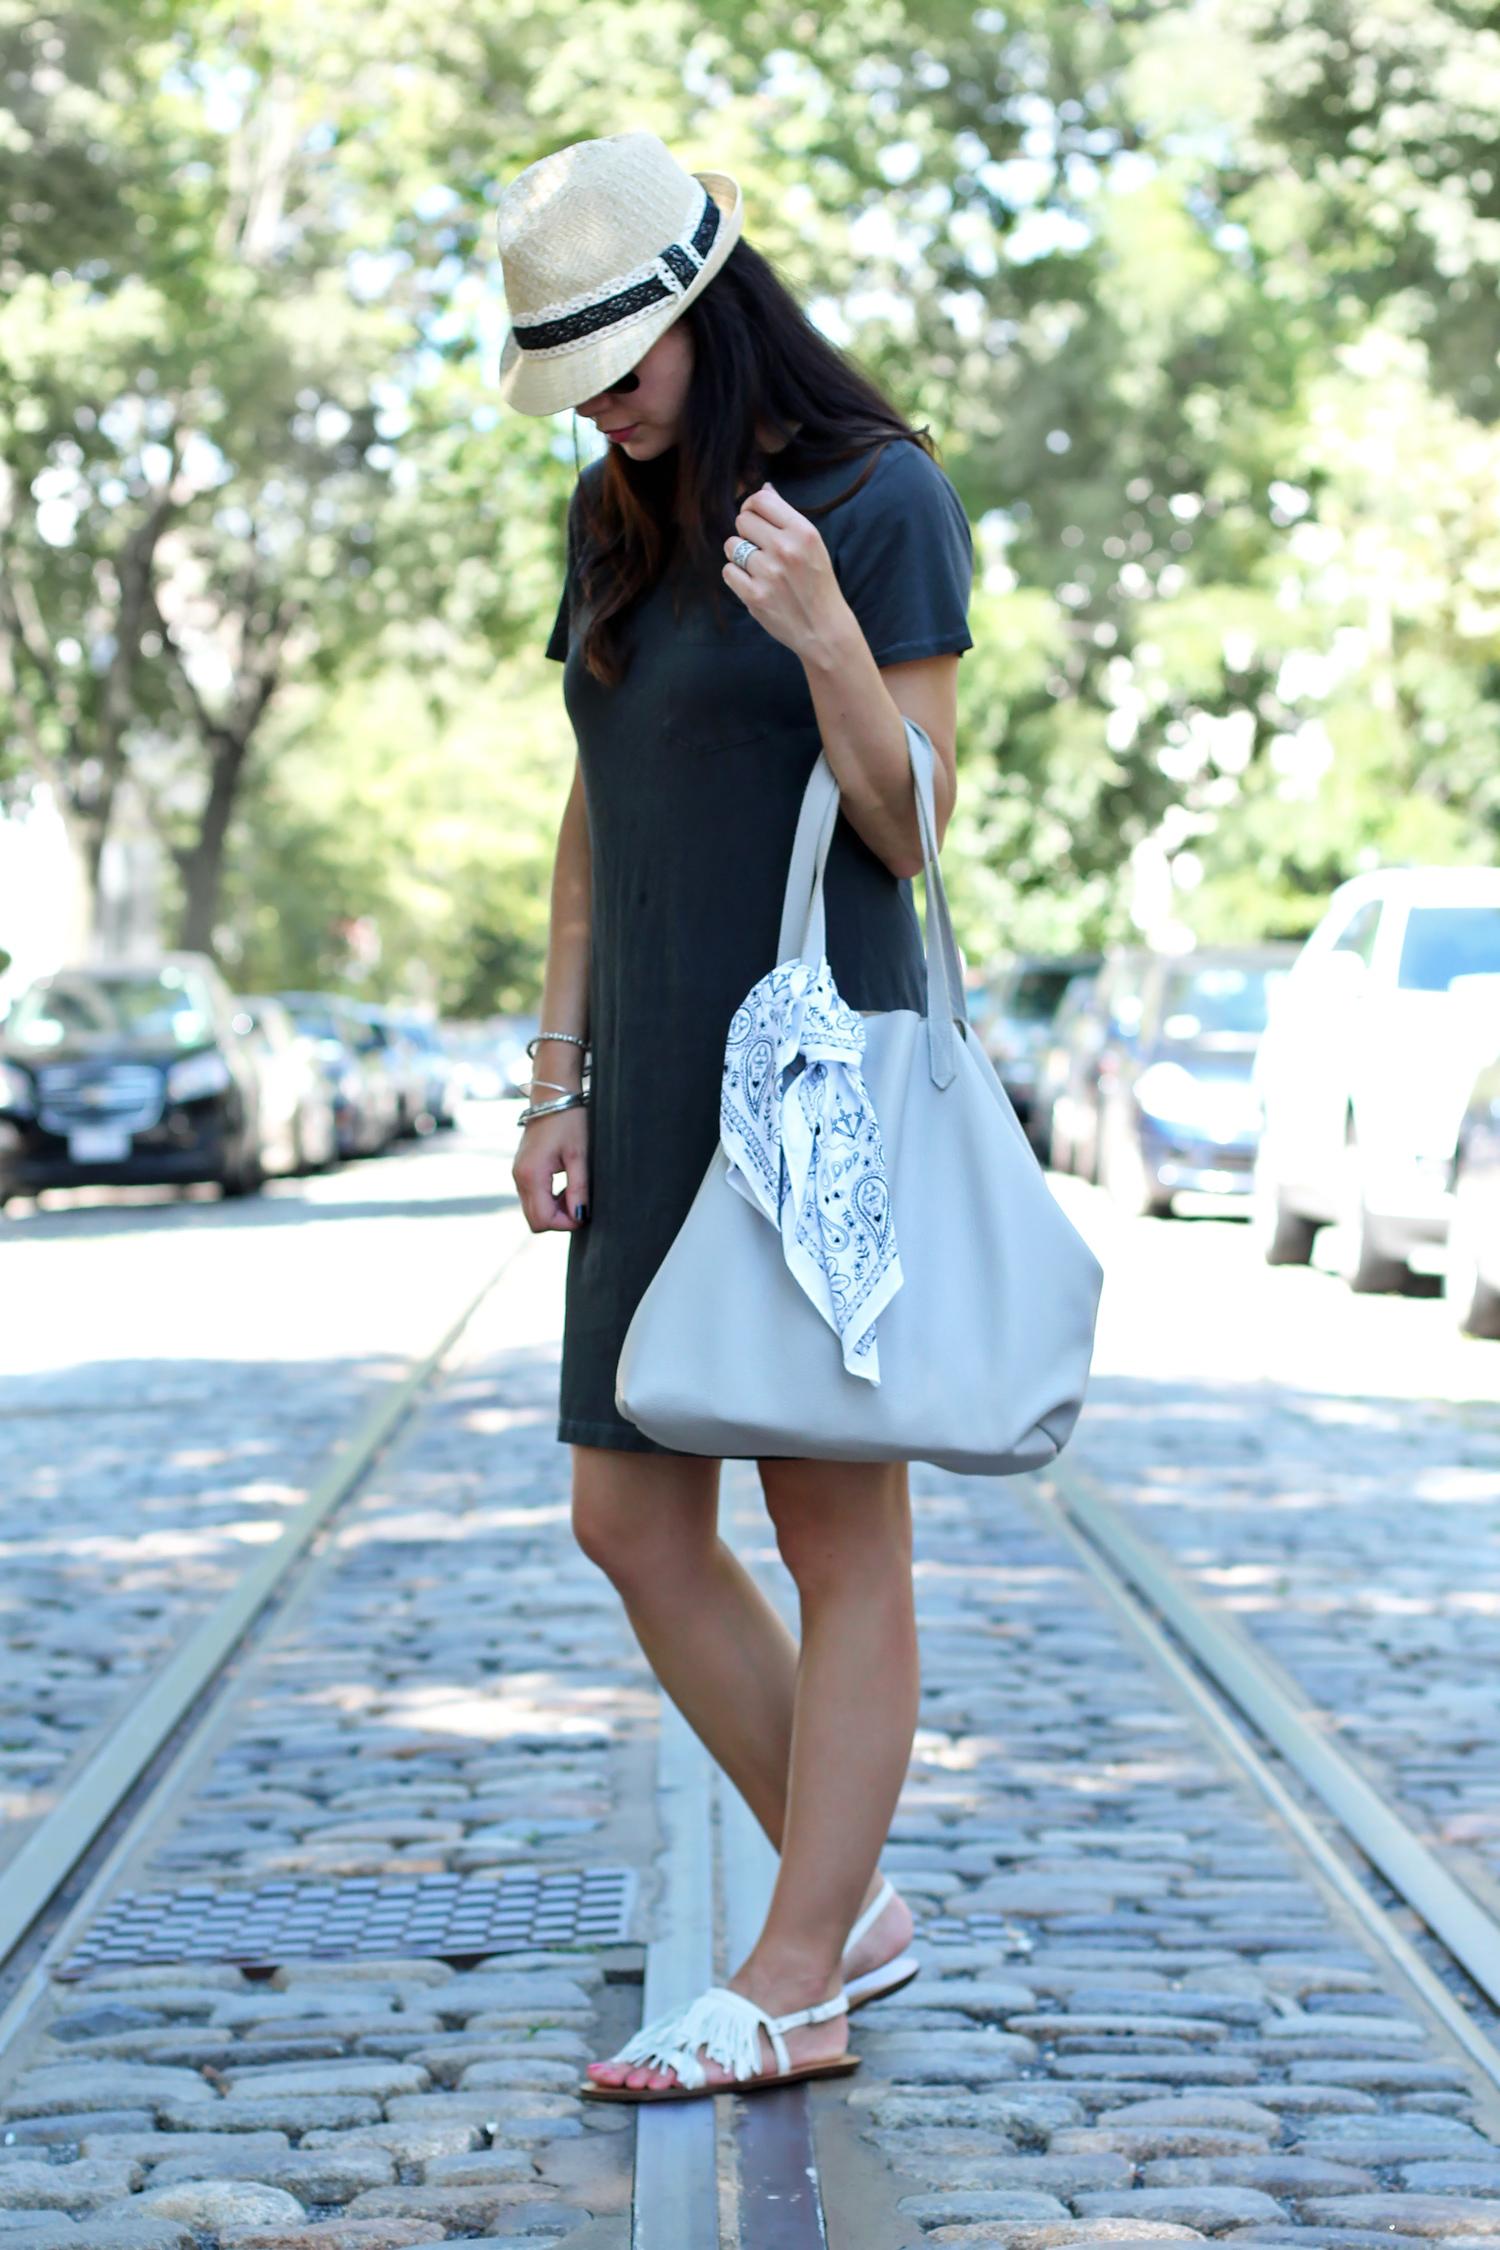 Cute summer dress style